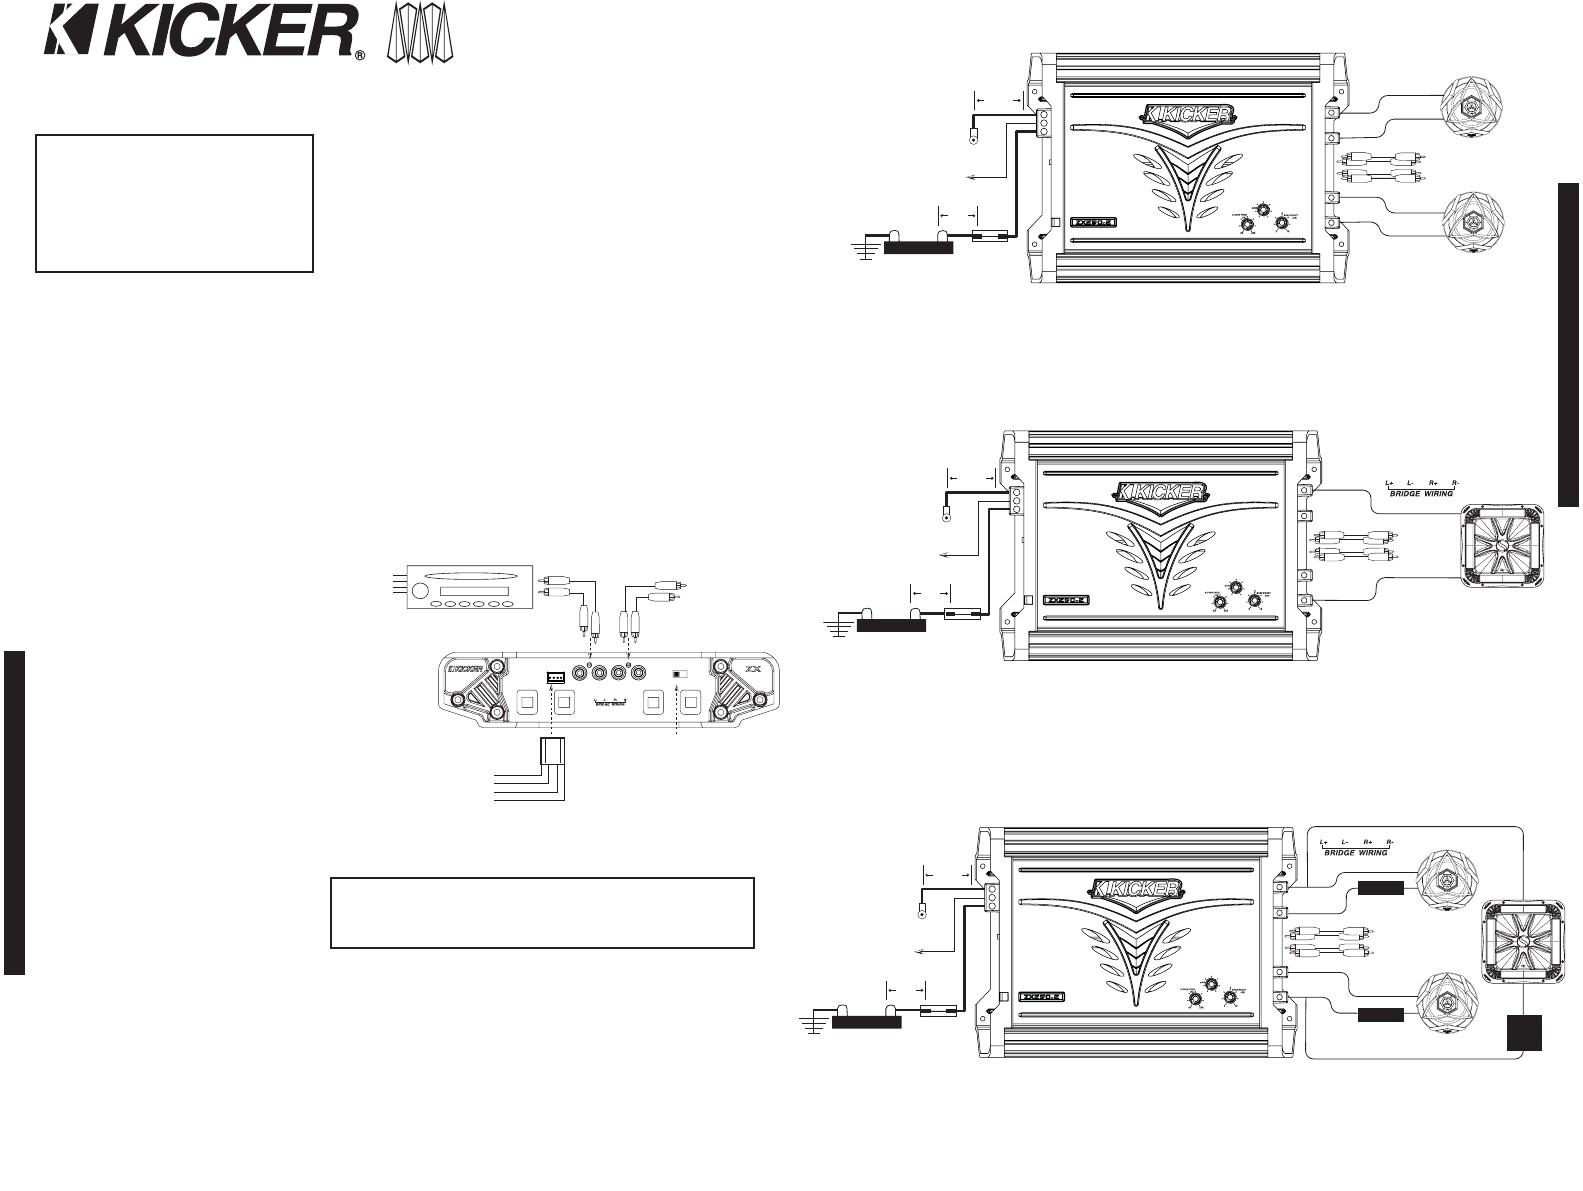 Kicker Bridge Wiring Example Electrical Wiring Diagram • Kicker Subwoofer Wiring Diagram Samples